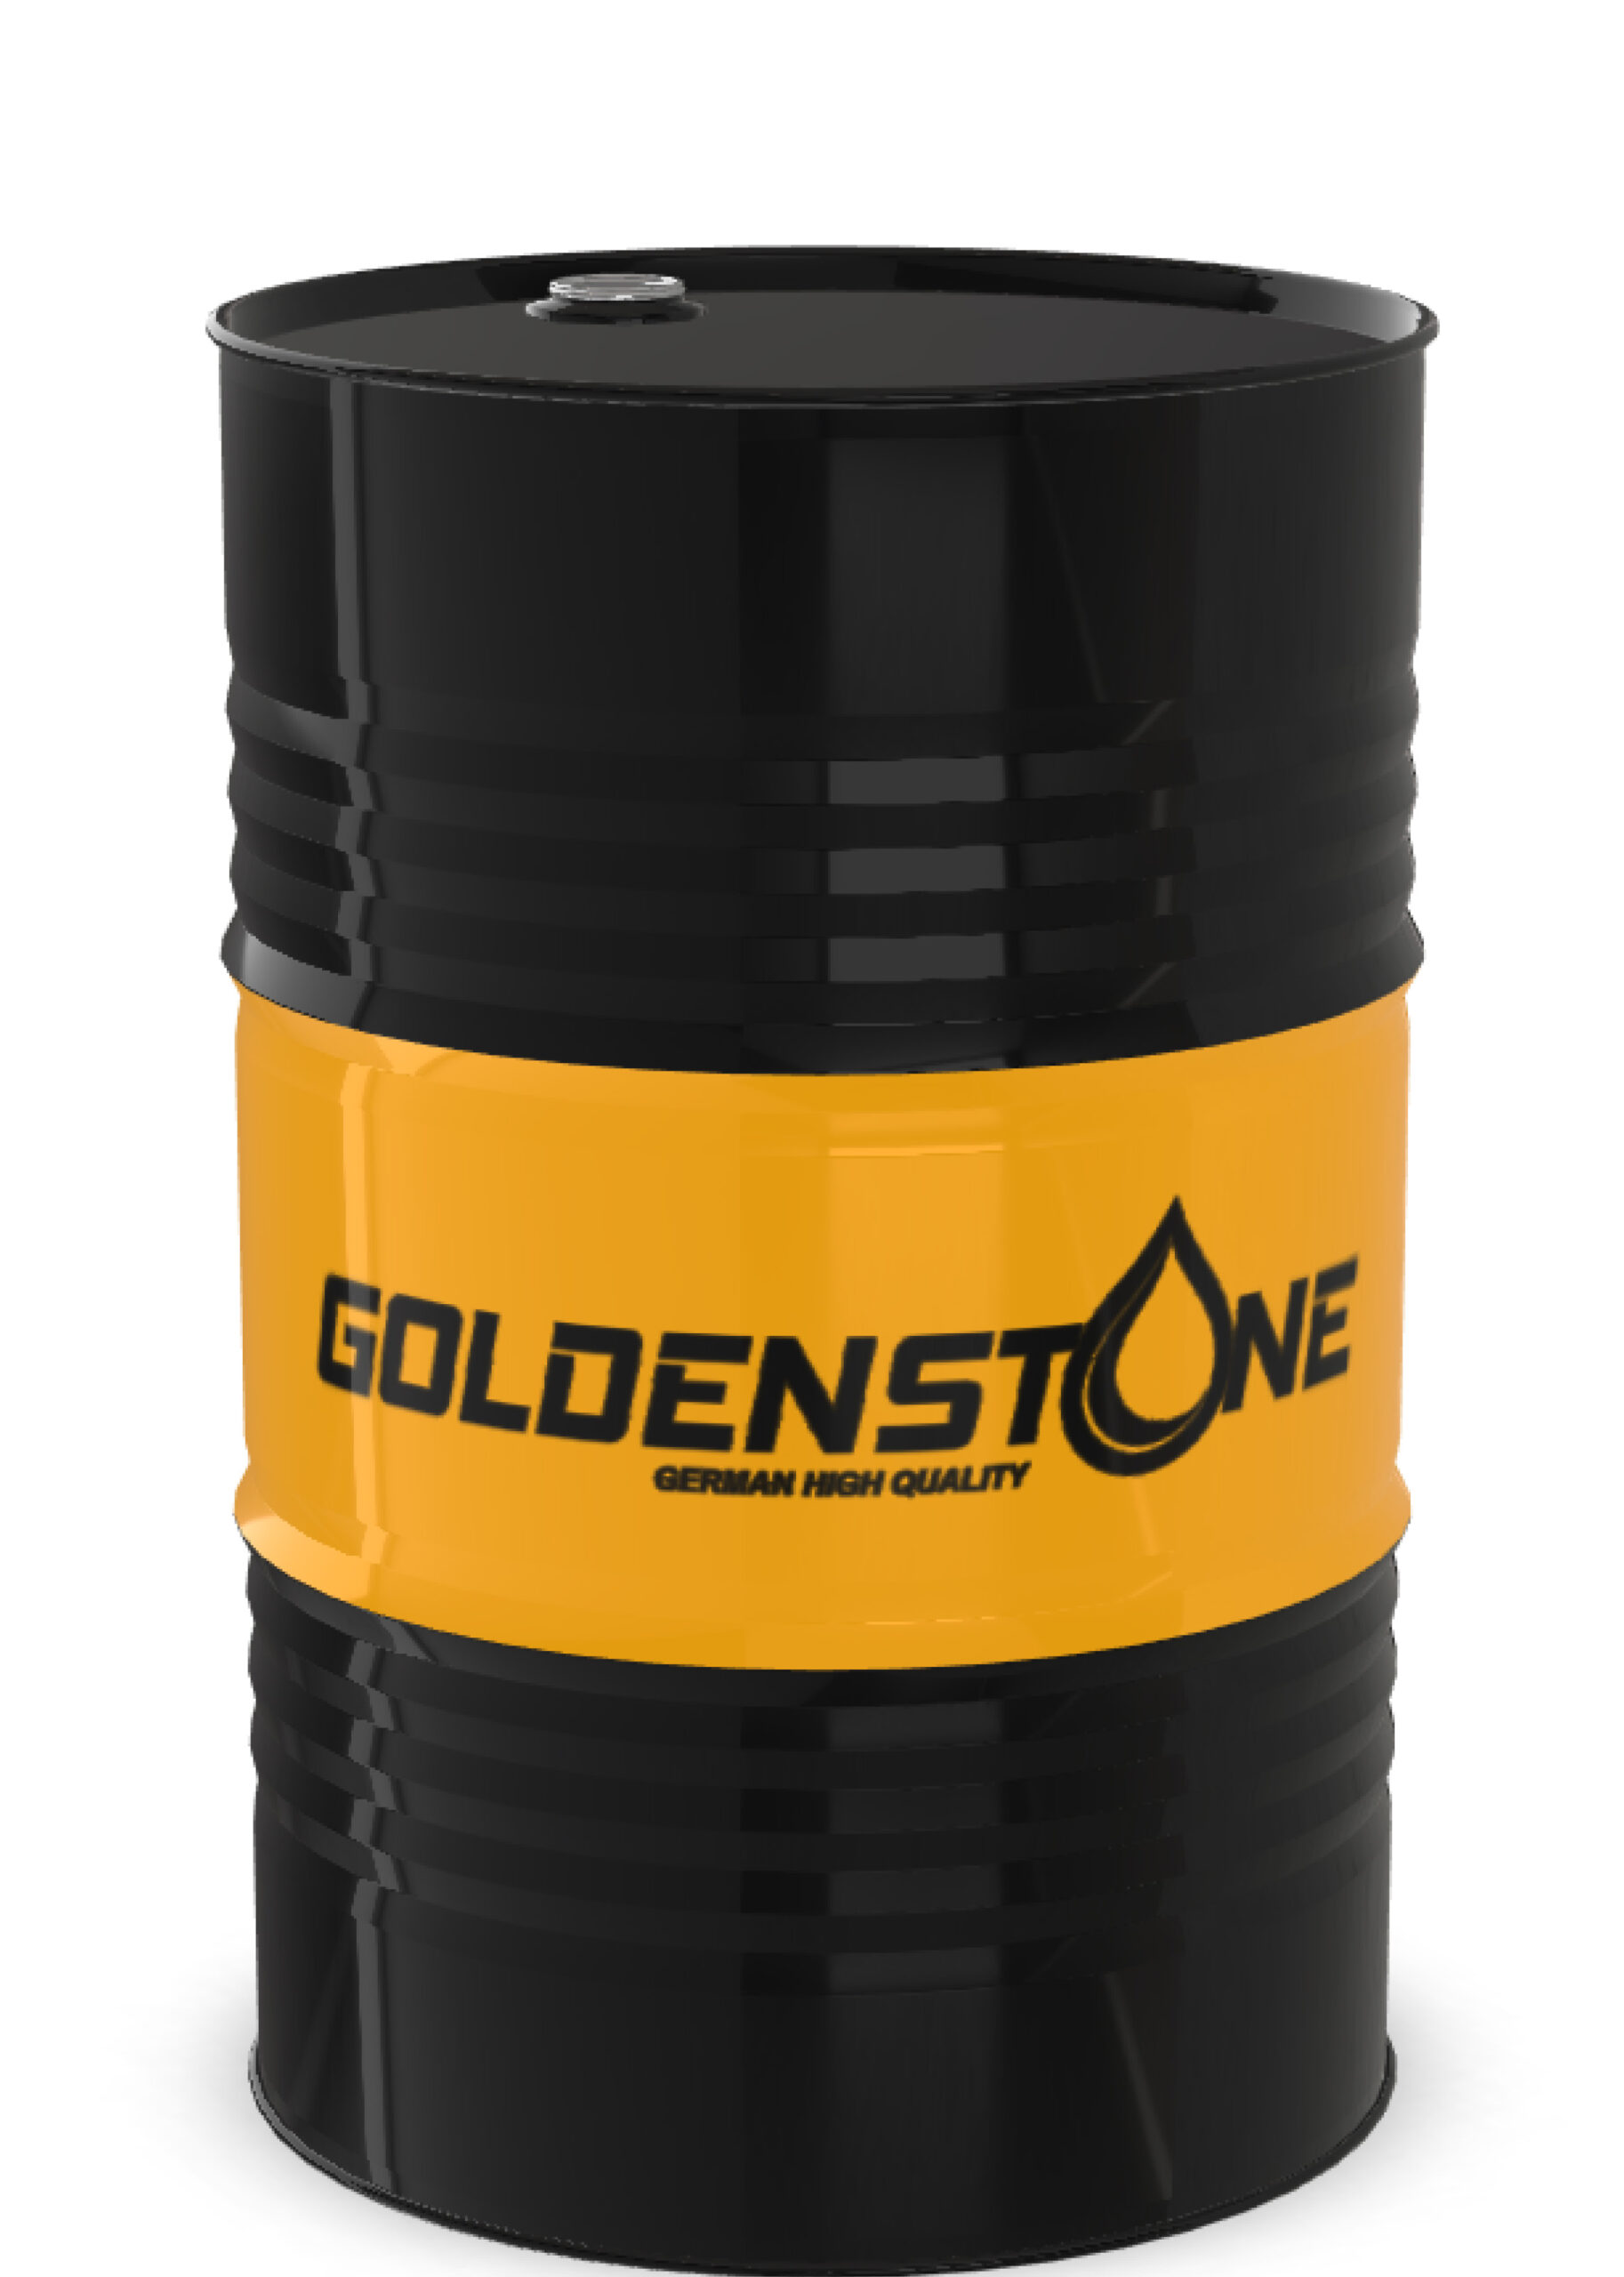 Goldenstone ATF OLIE MB 236.15 60liter